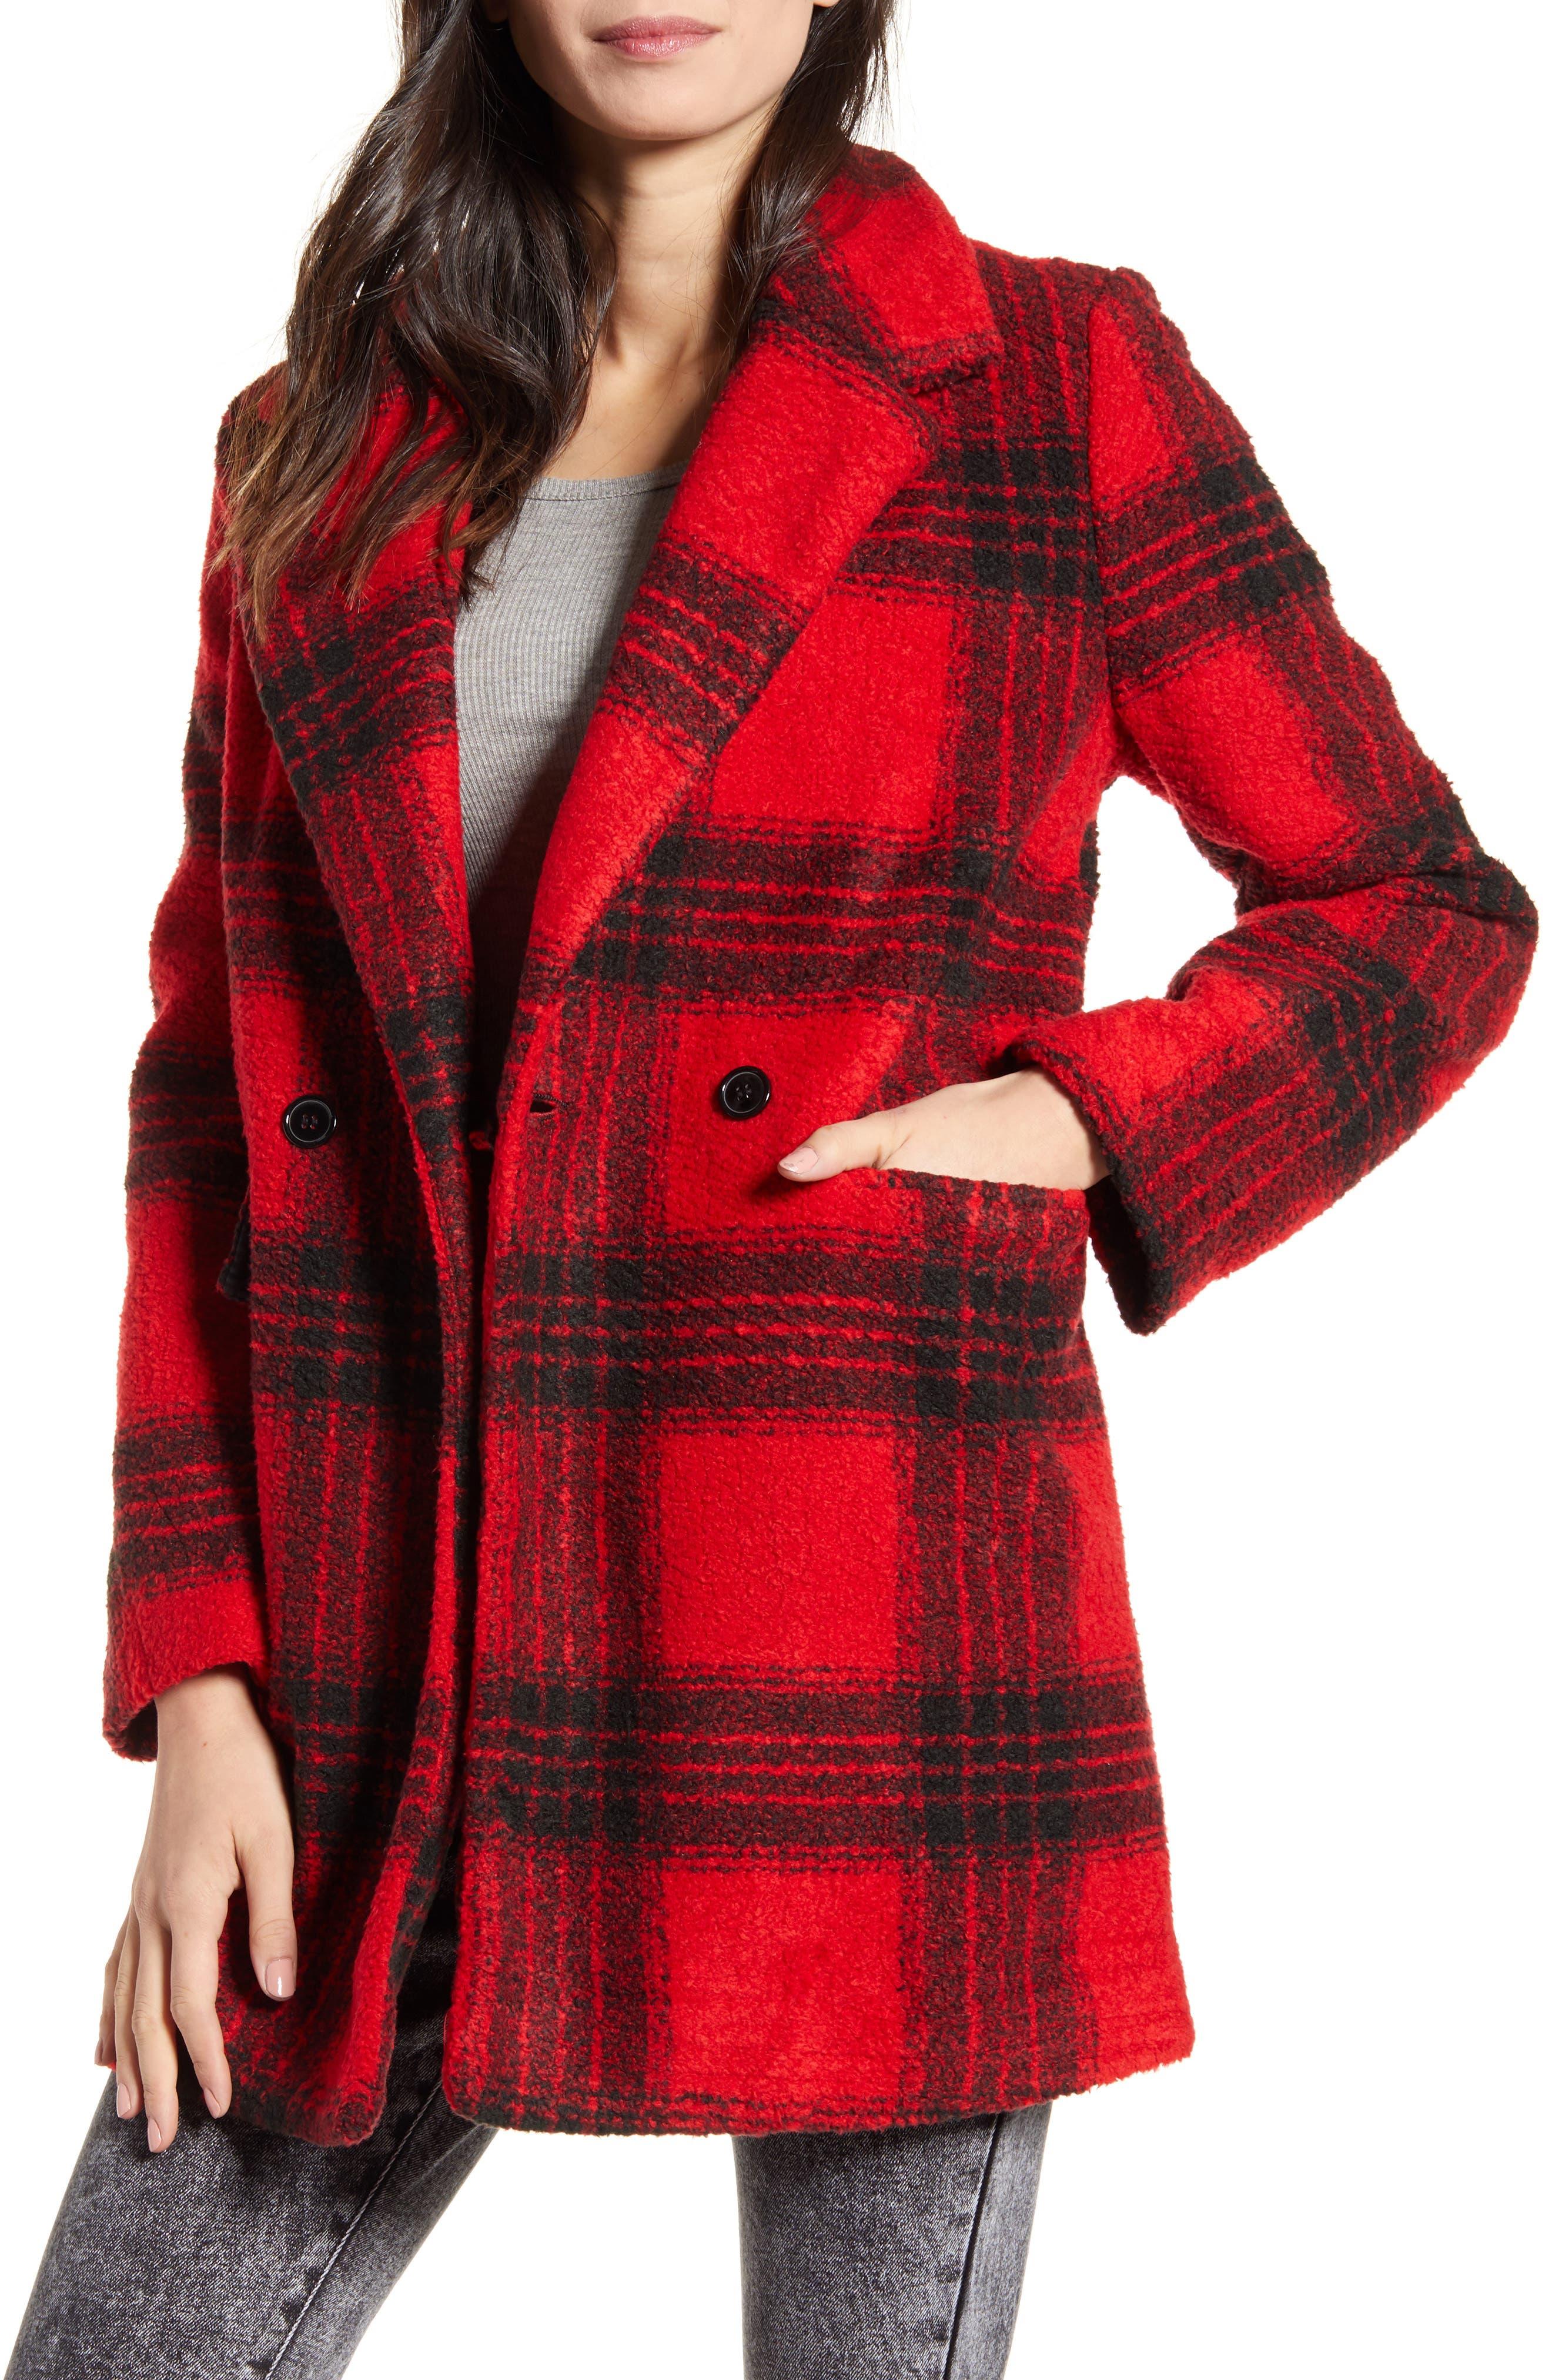 NEW Womens IKE BEHAR Black Checks Faux Mink Dressy Jacket Coat Size Large L